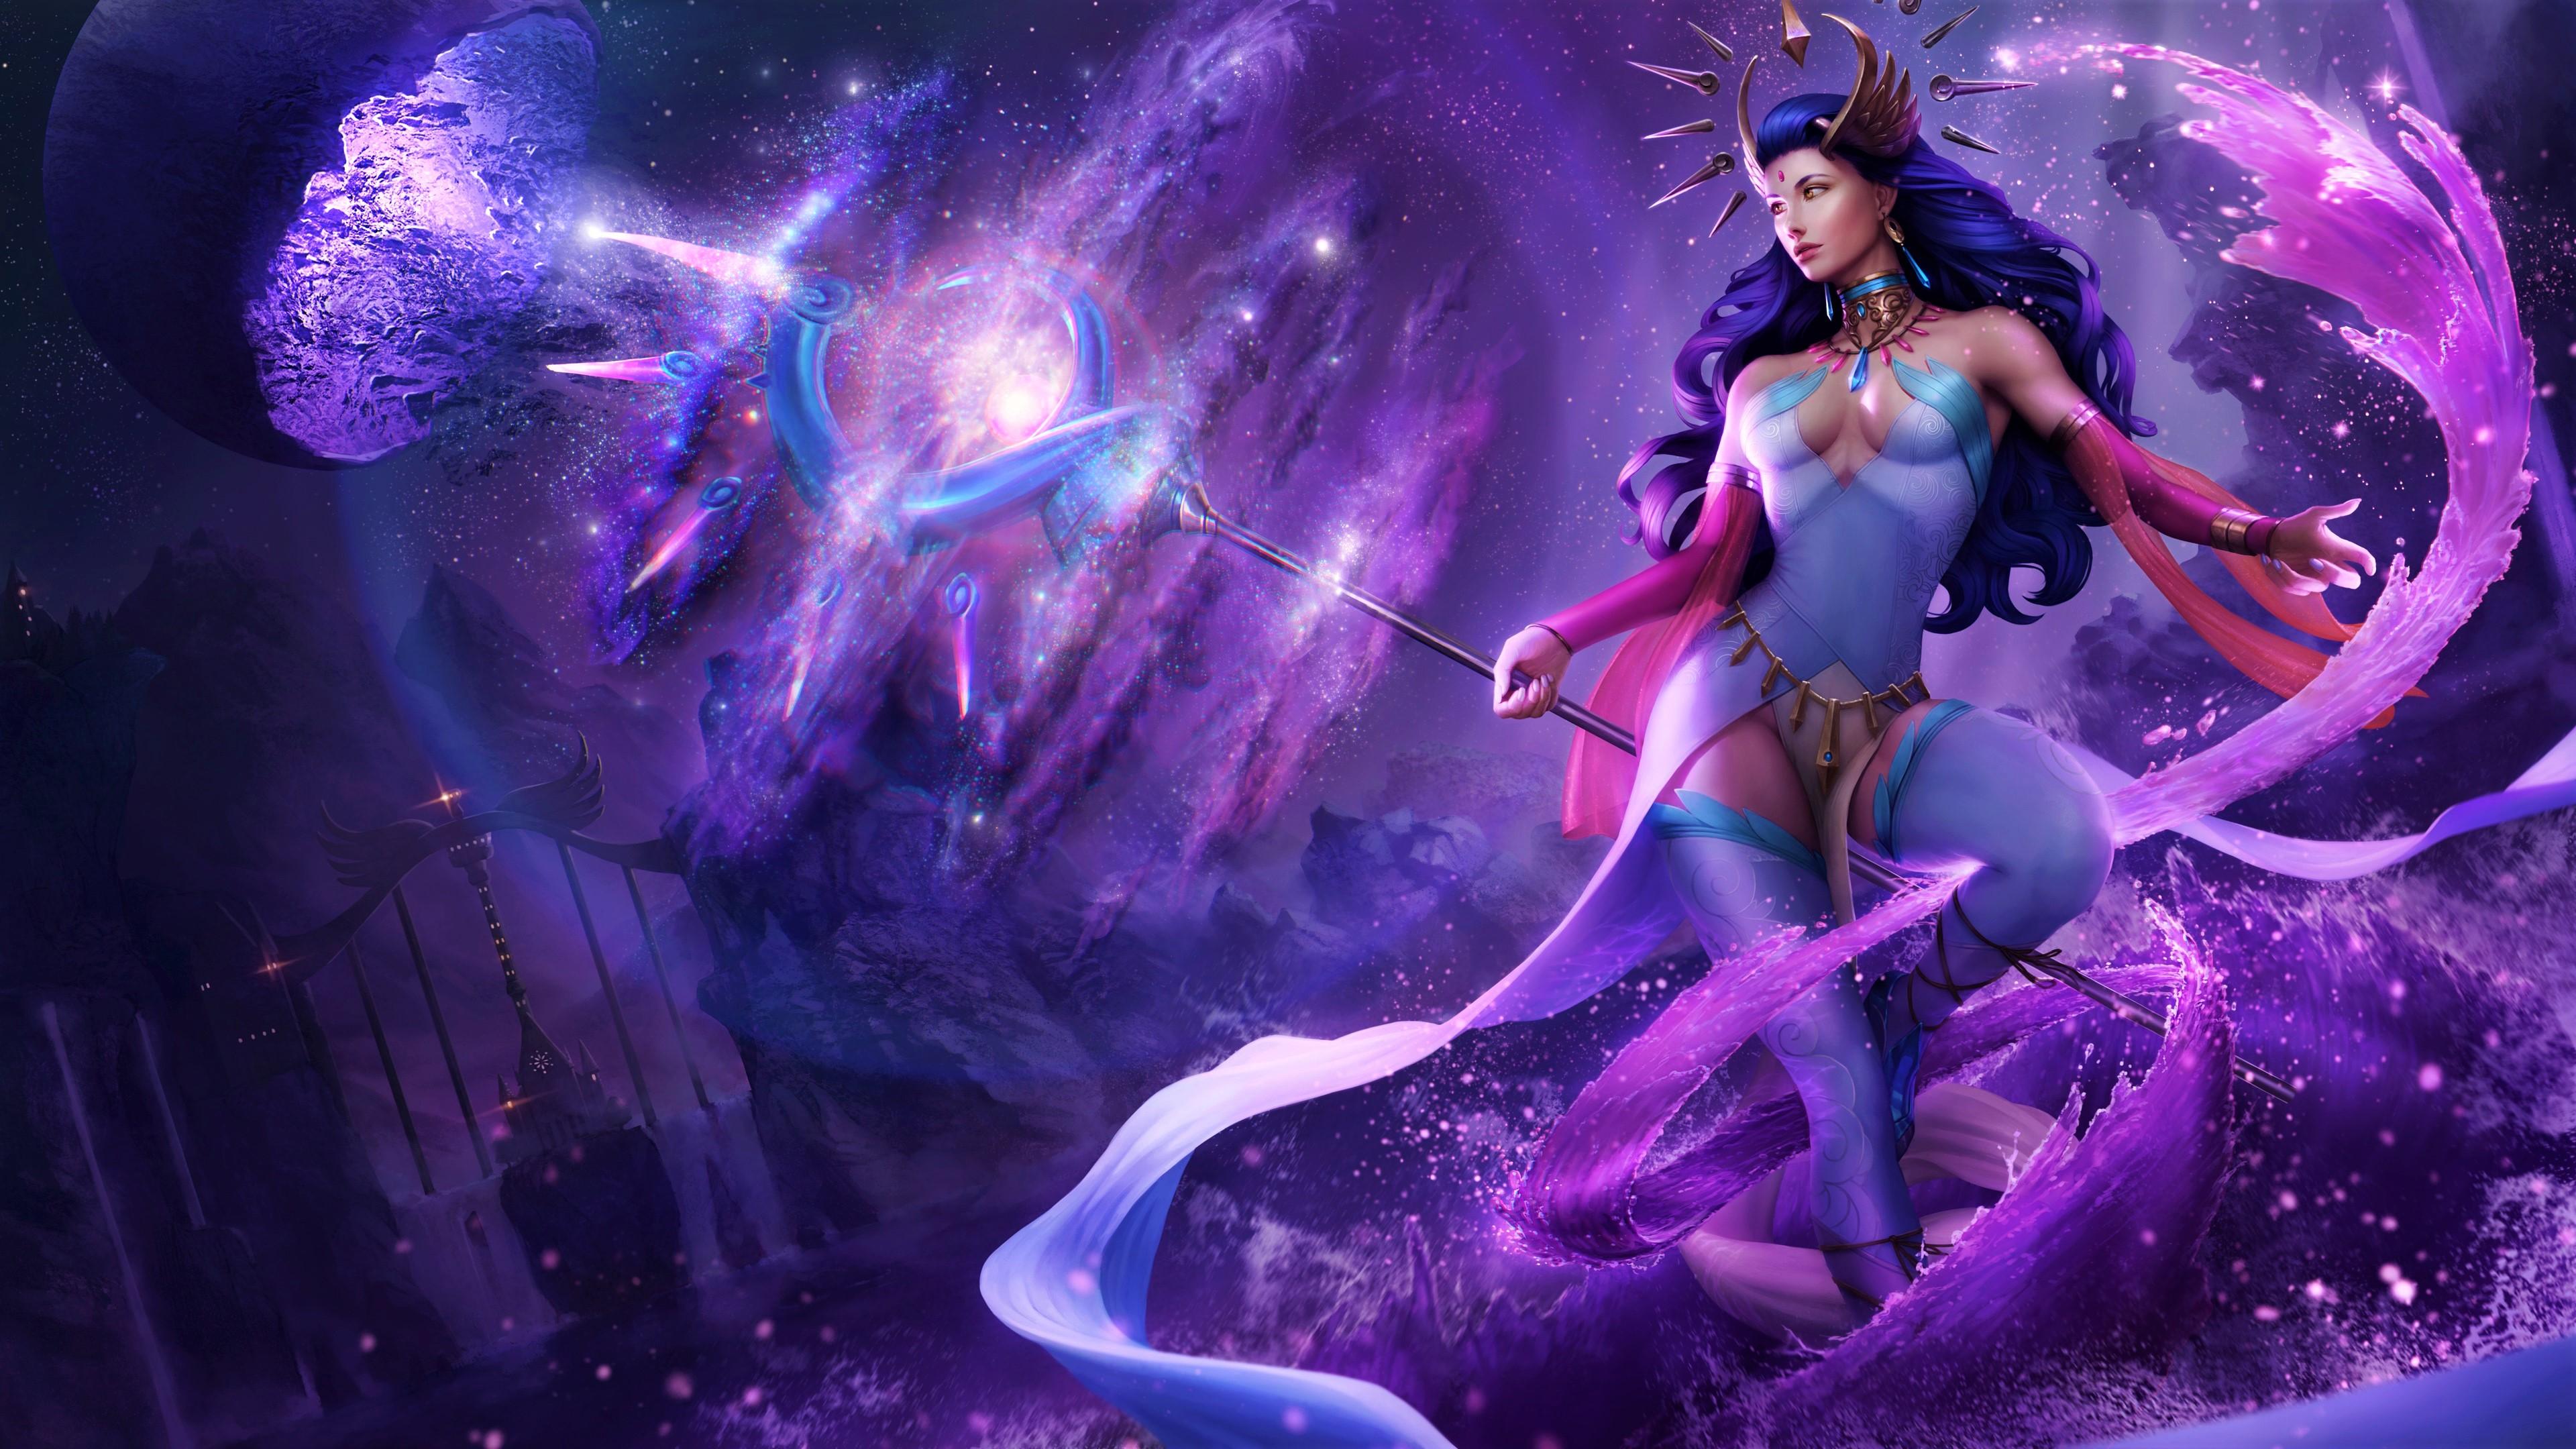 Purple Fantasy Girl Wallpapers Wallpaper Cave